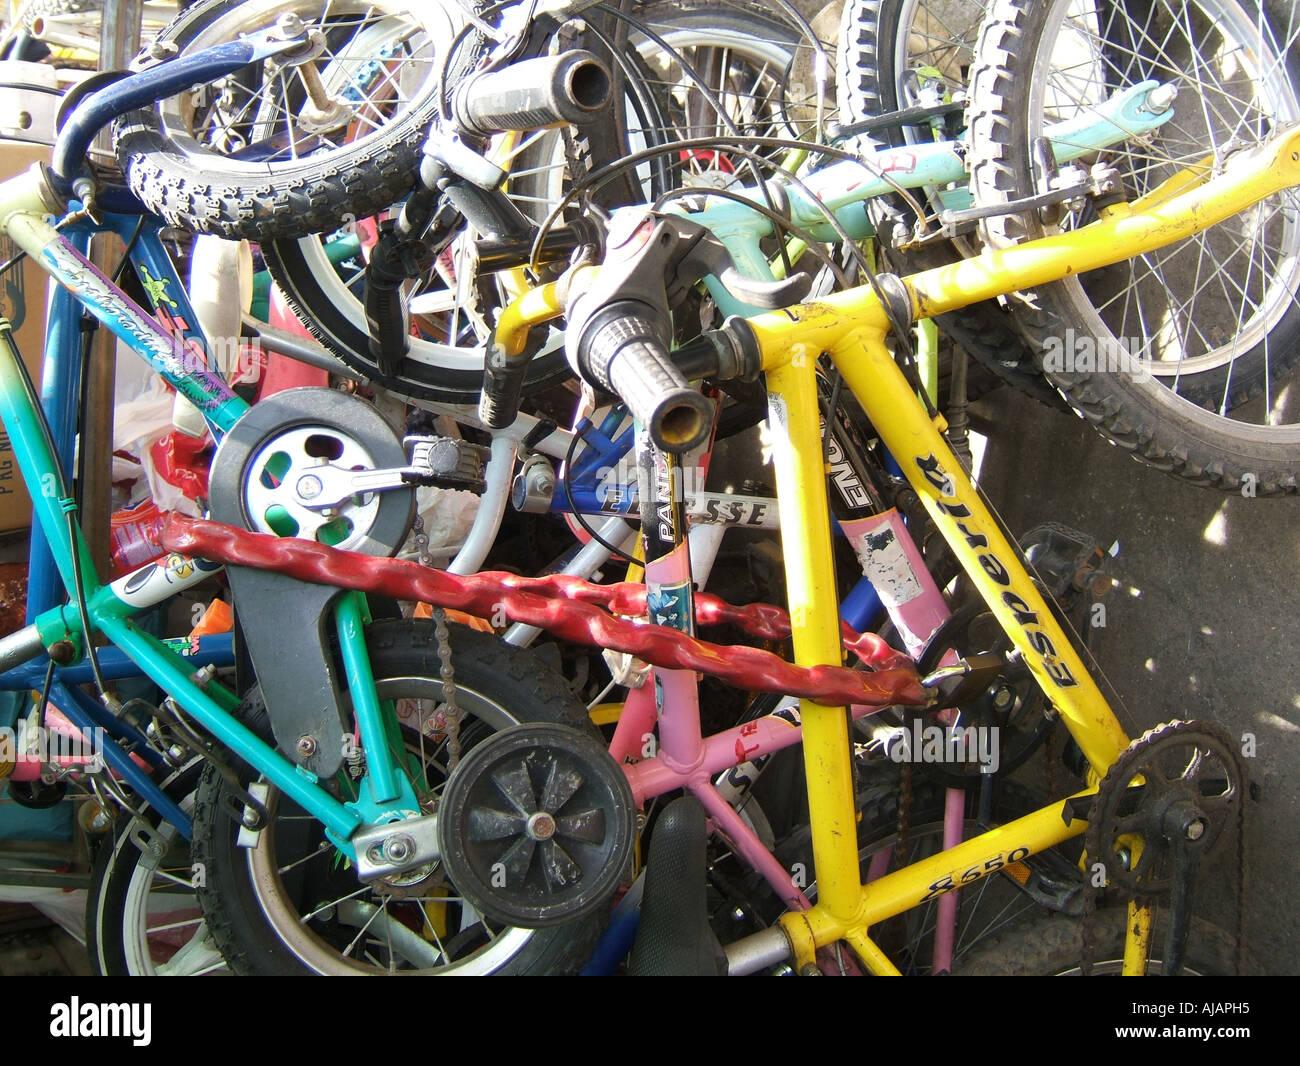 pile of second hand bikes Stock Photo: 8387220 - Alamy